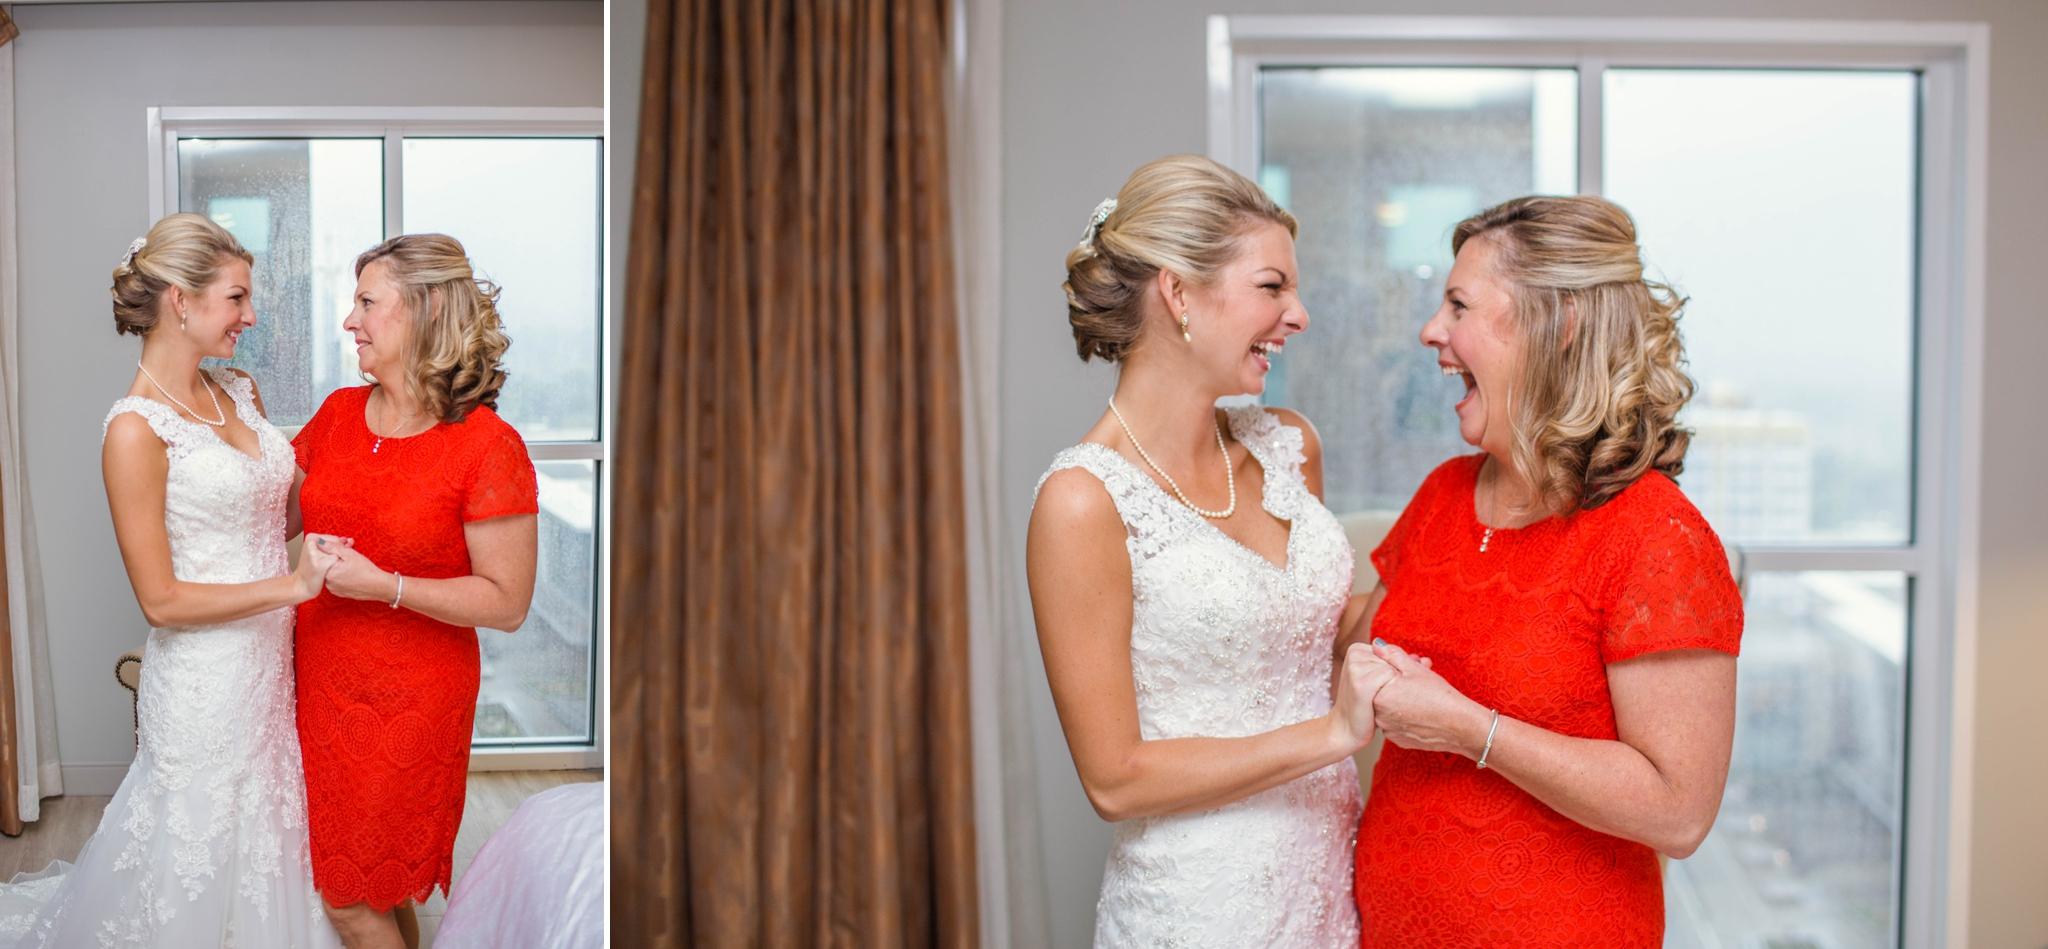 Raleigh North Carolina Wedding Photographer at the Downtown Sheraton Hotel